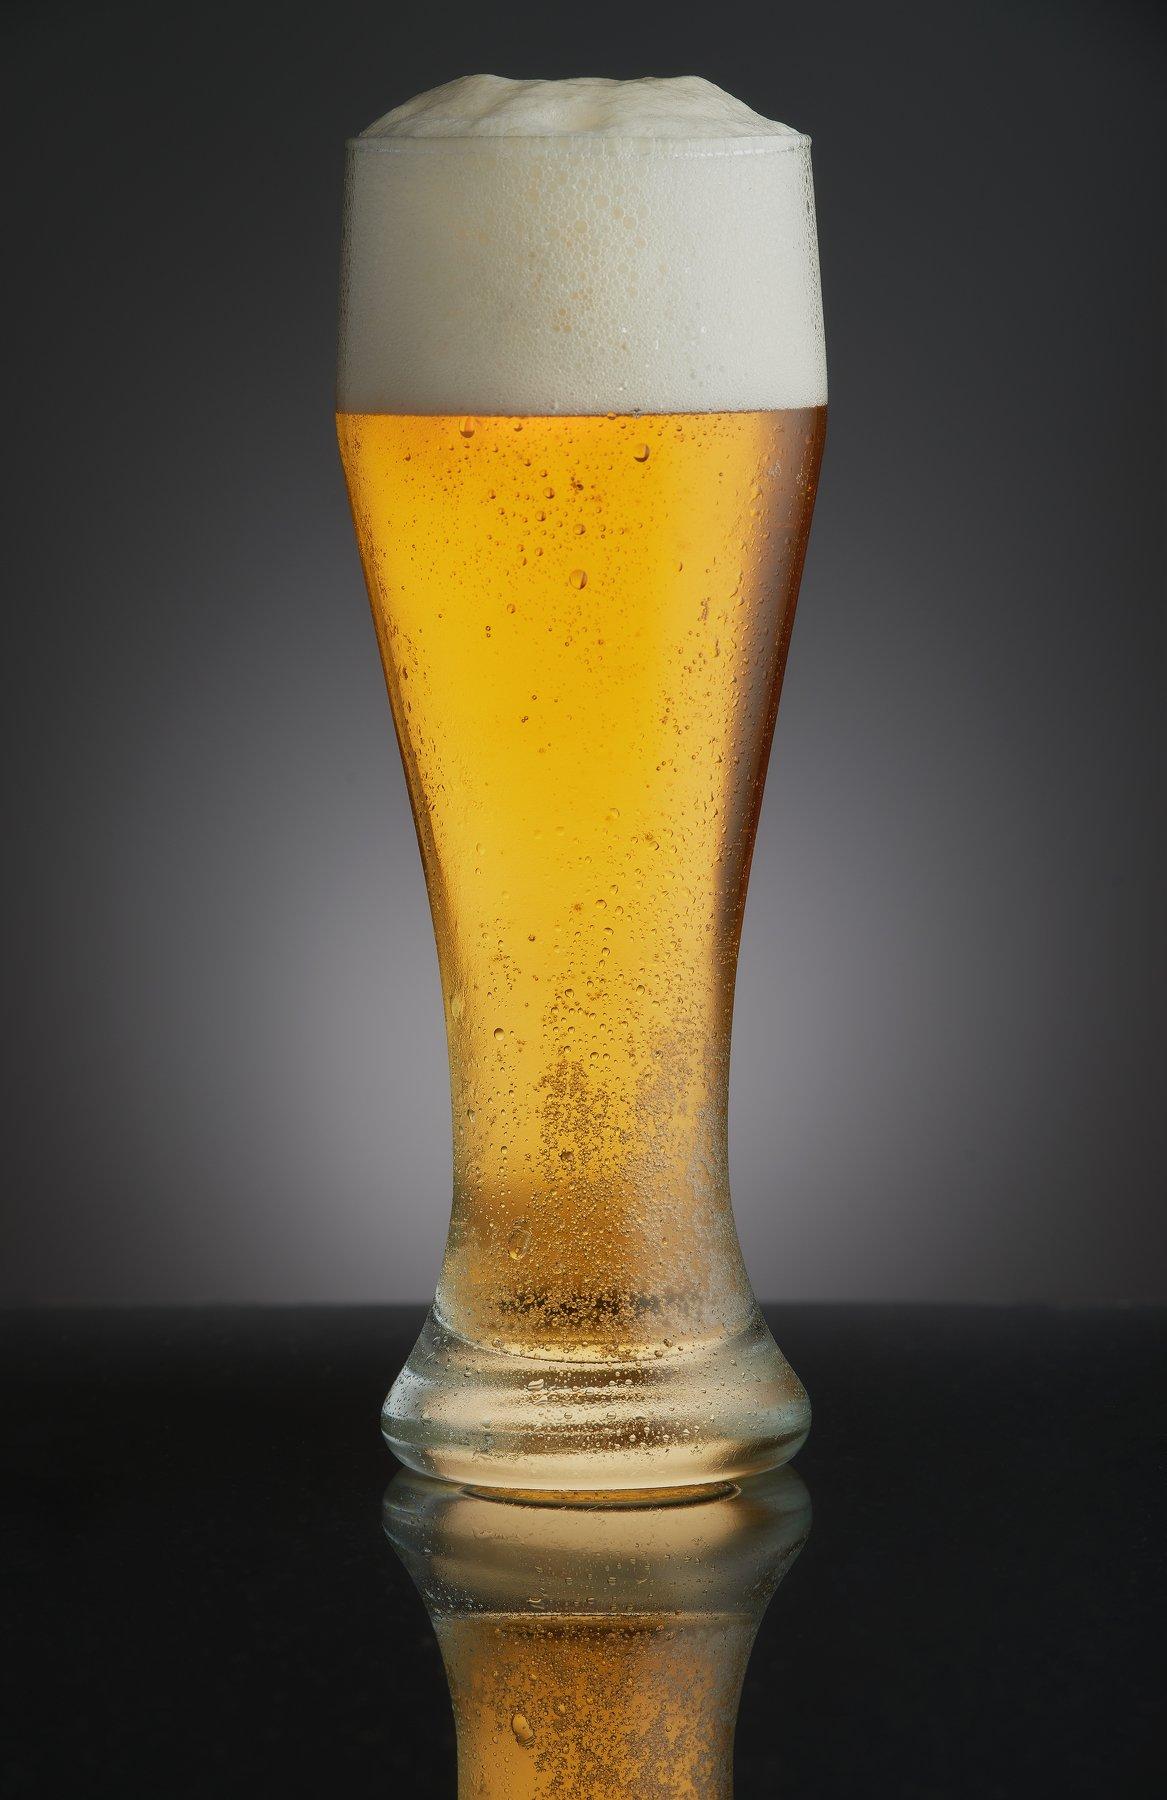 beer,drink,foam,glass,light beer,lager,alcohol,gas,bubbles, Andrey Filonenko